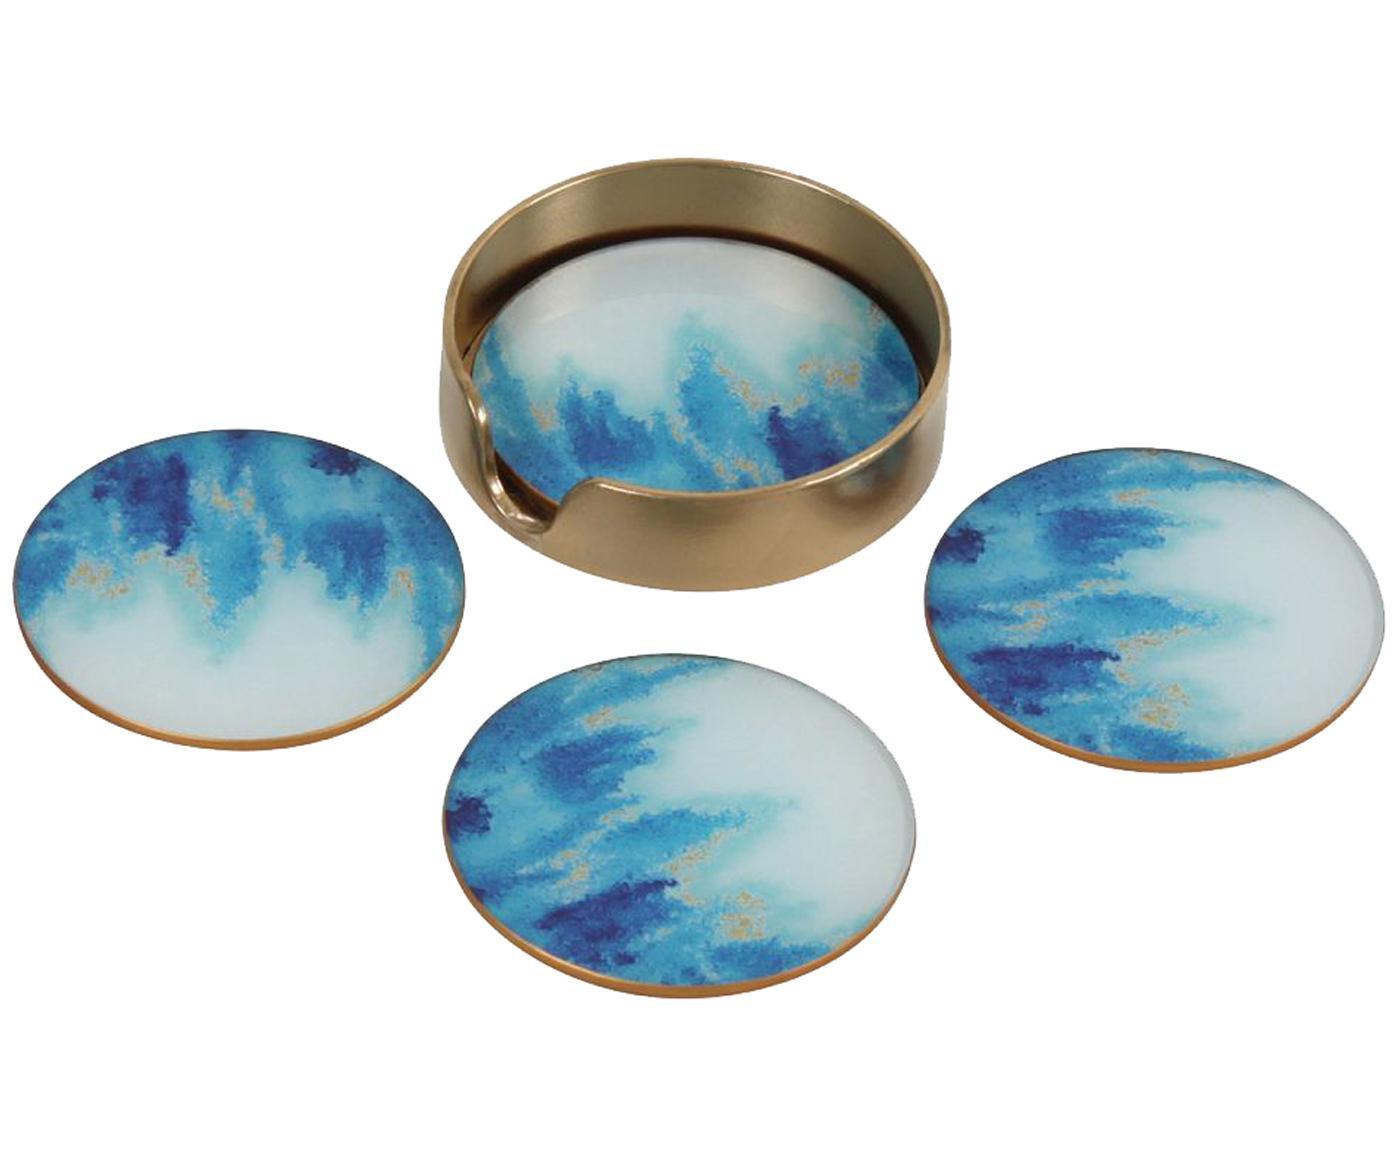 Komplet podstawek Stardust, 5 elem., Niebieski, biały, Ø 11 cm